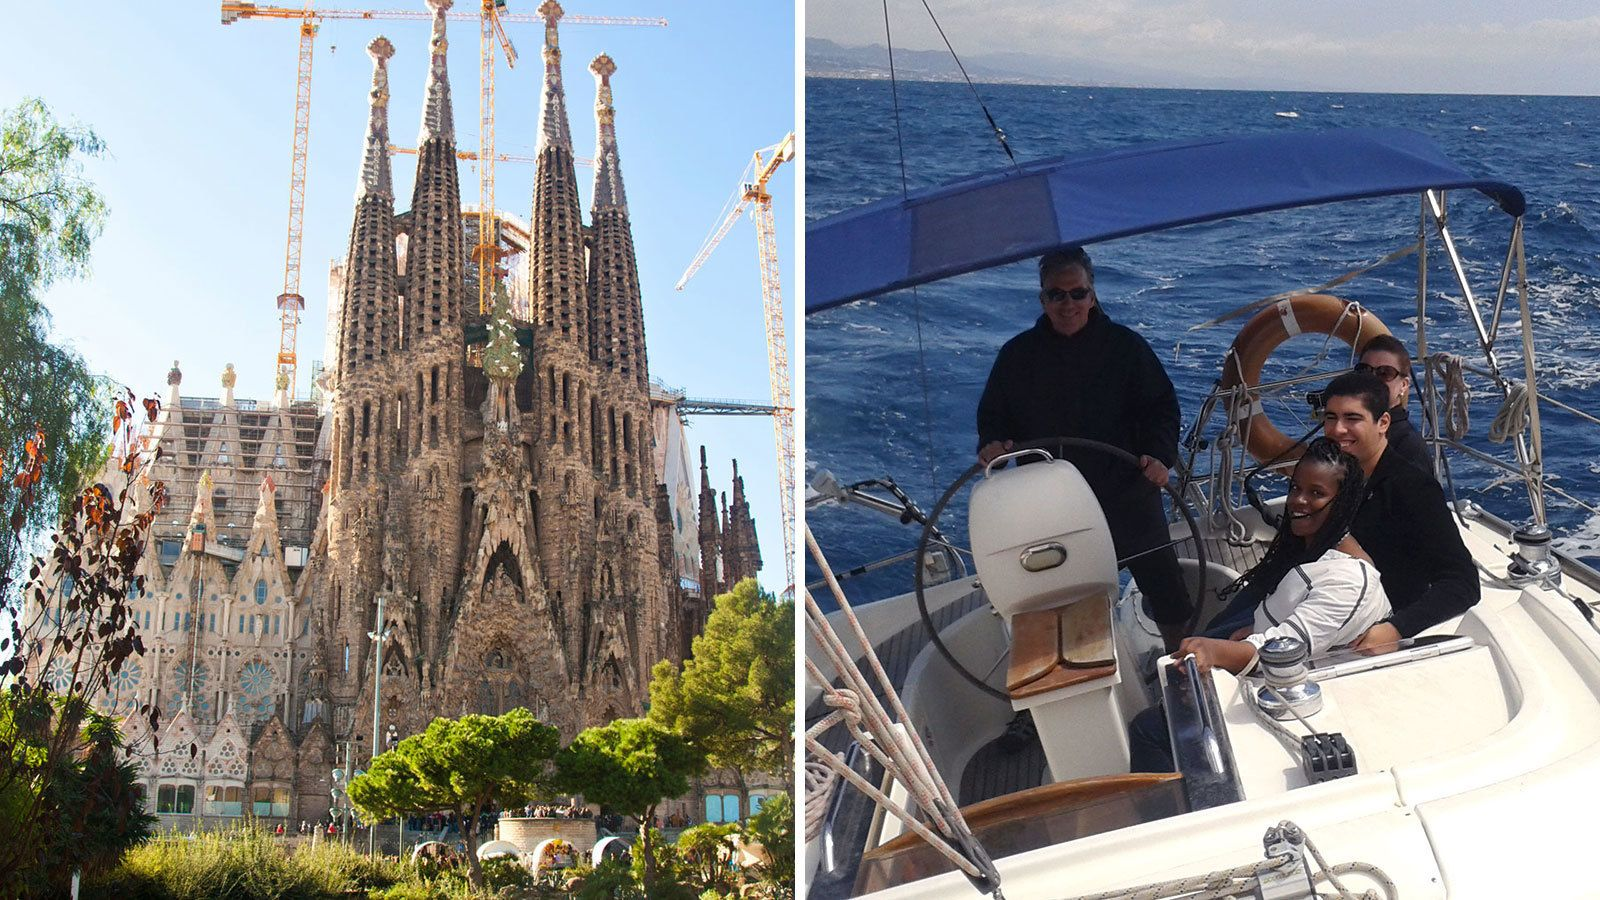 Split image of La Sagrada Familia cathedral and a sailing group on a boat off the coast of Barcelona